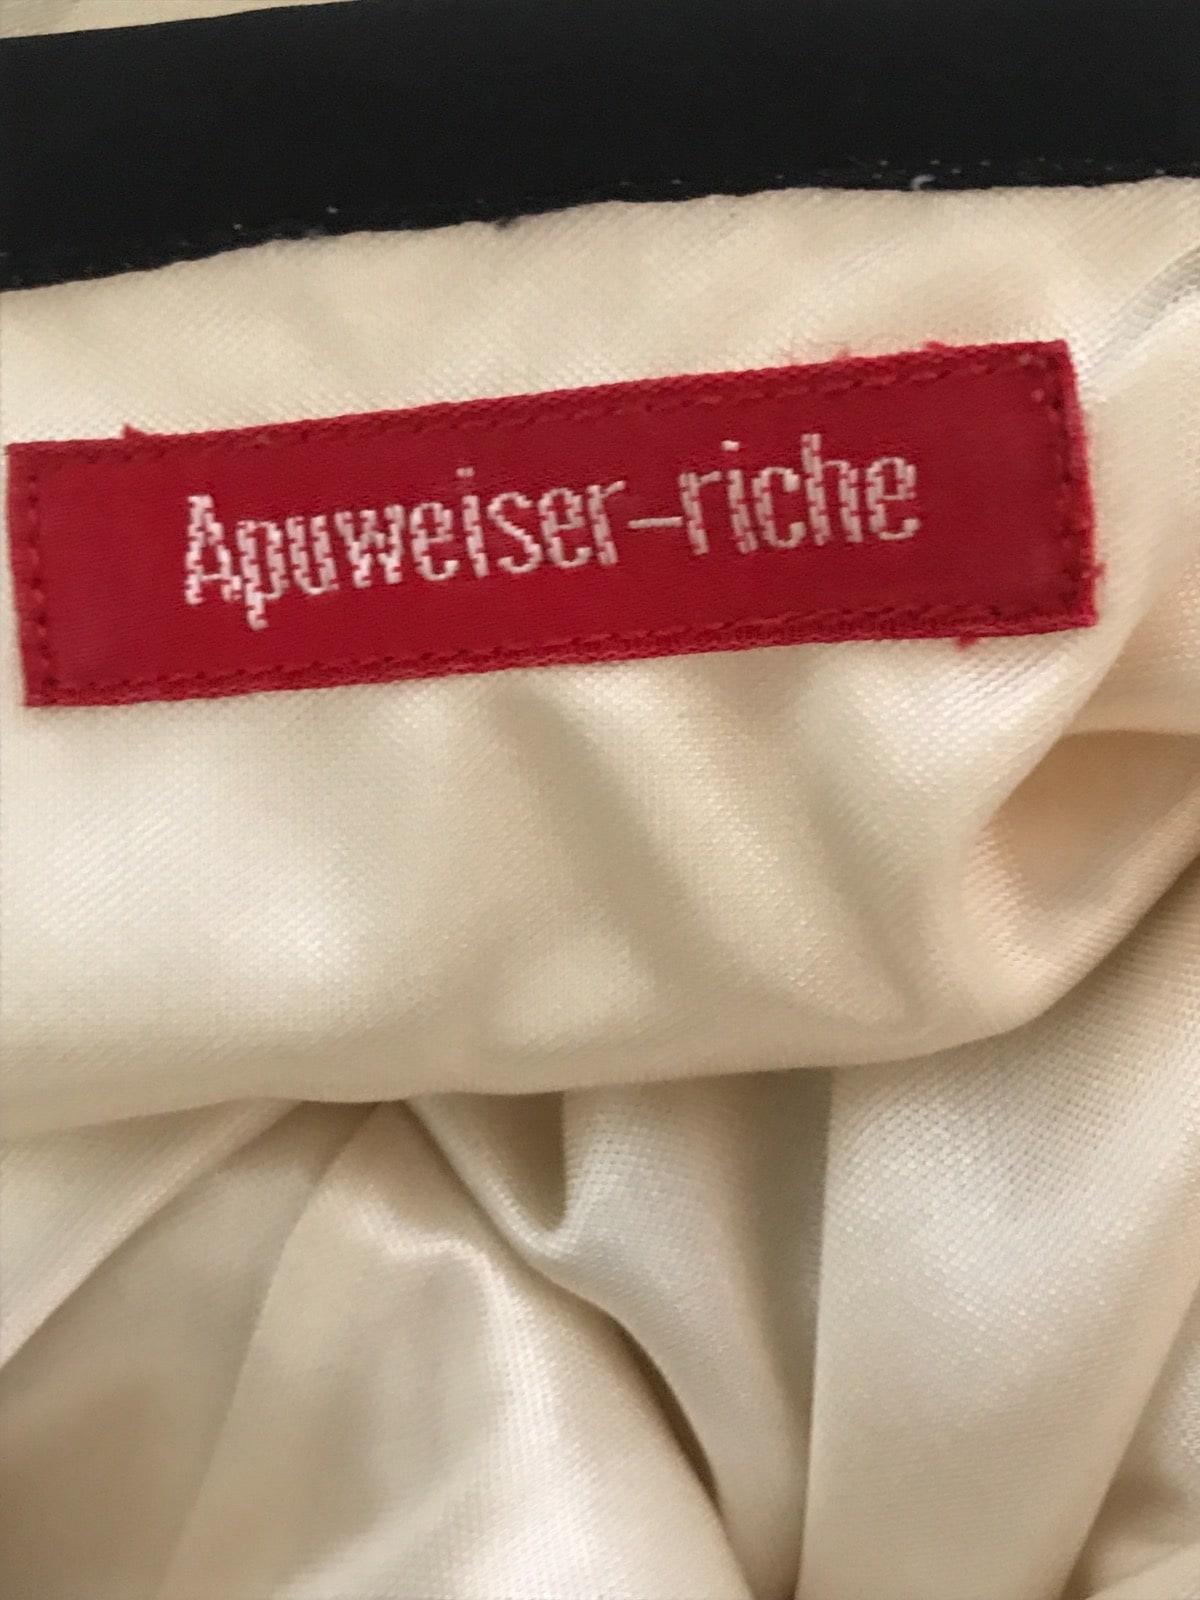 Apuweiser-riche(アプワイザーリッシェ)のカットソー